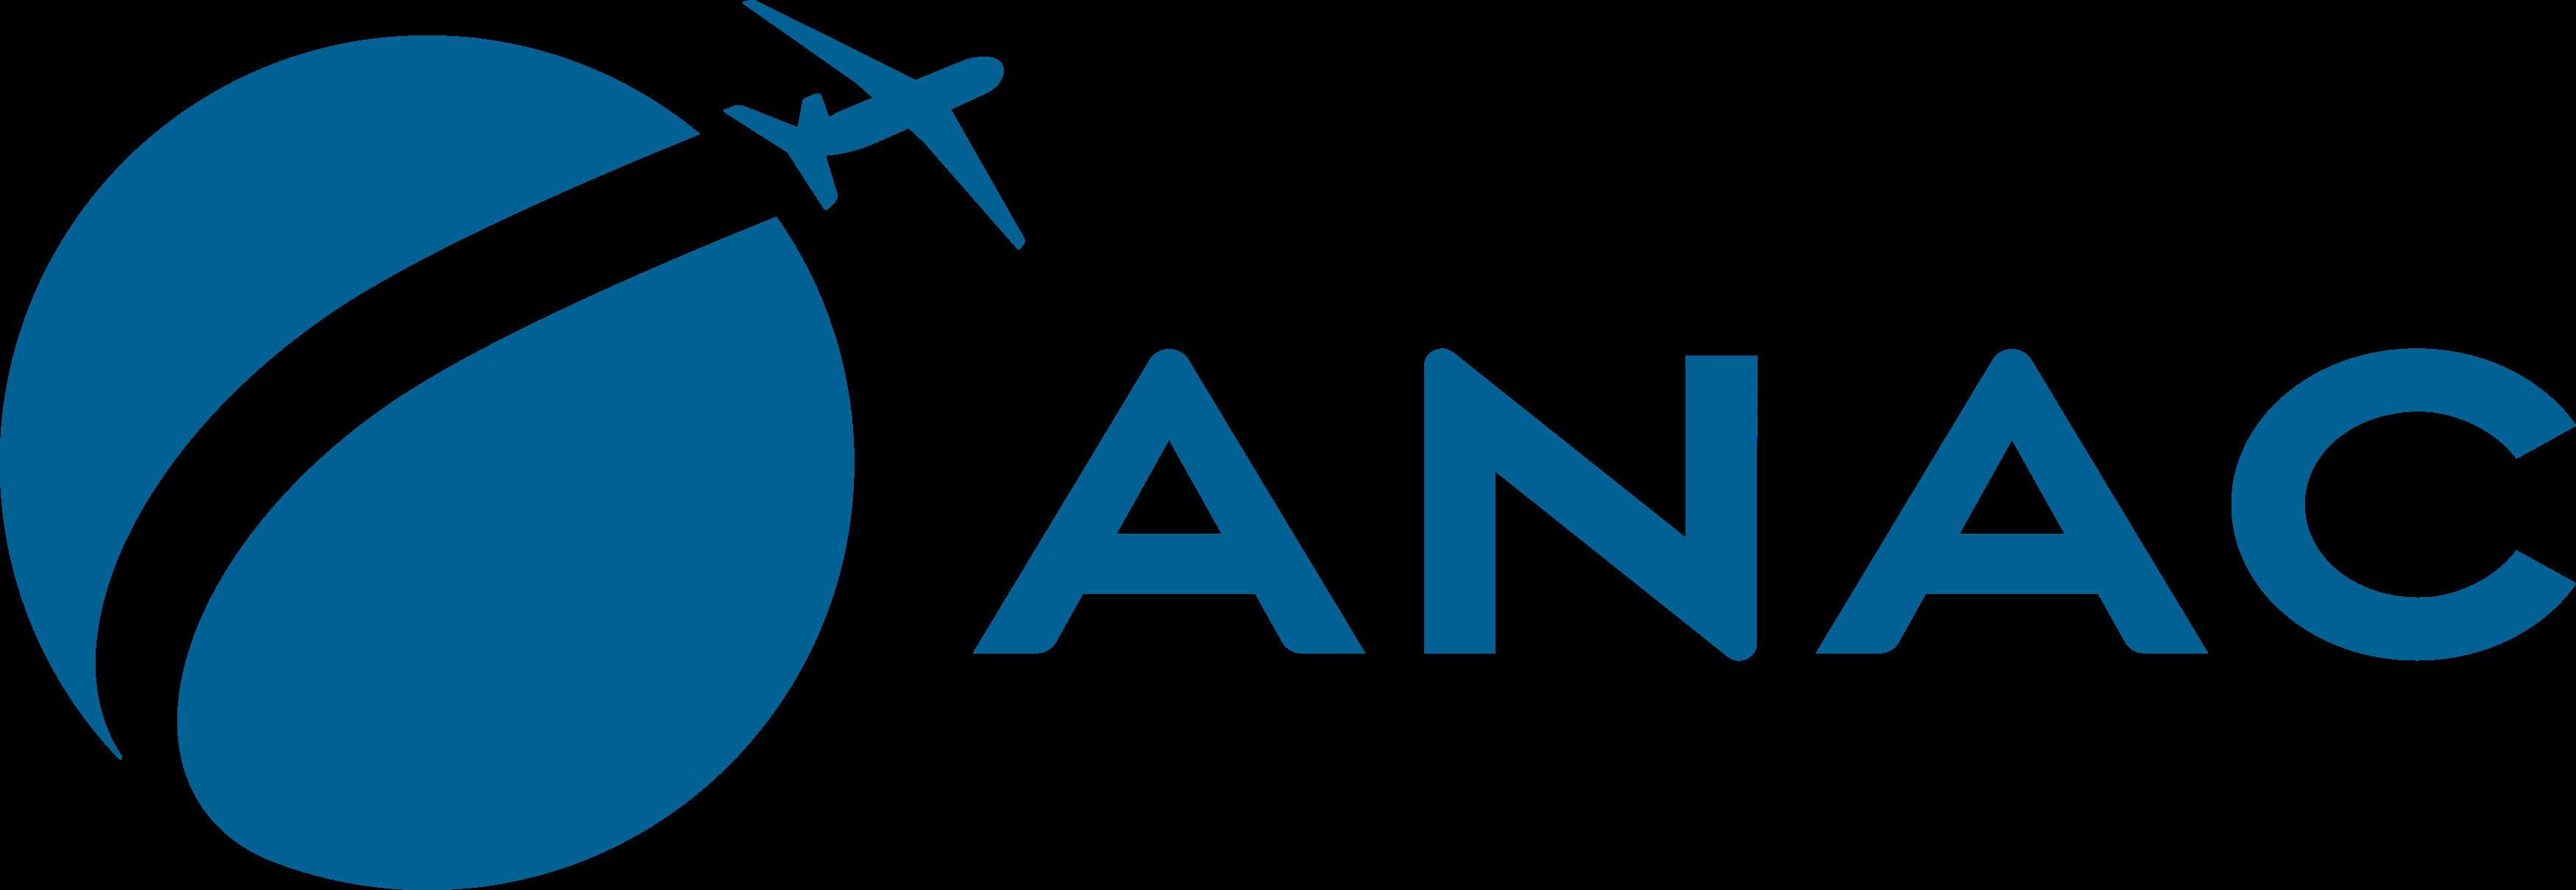 ANAC Brasil_Isologotype